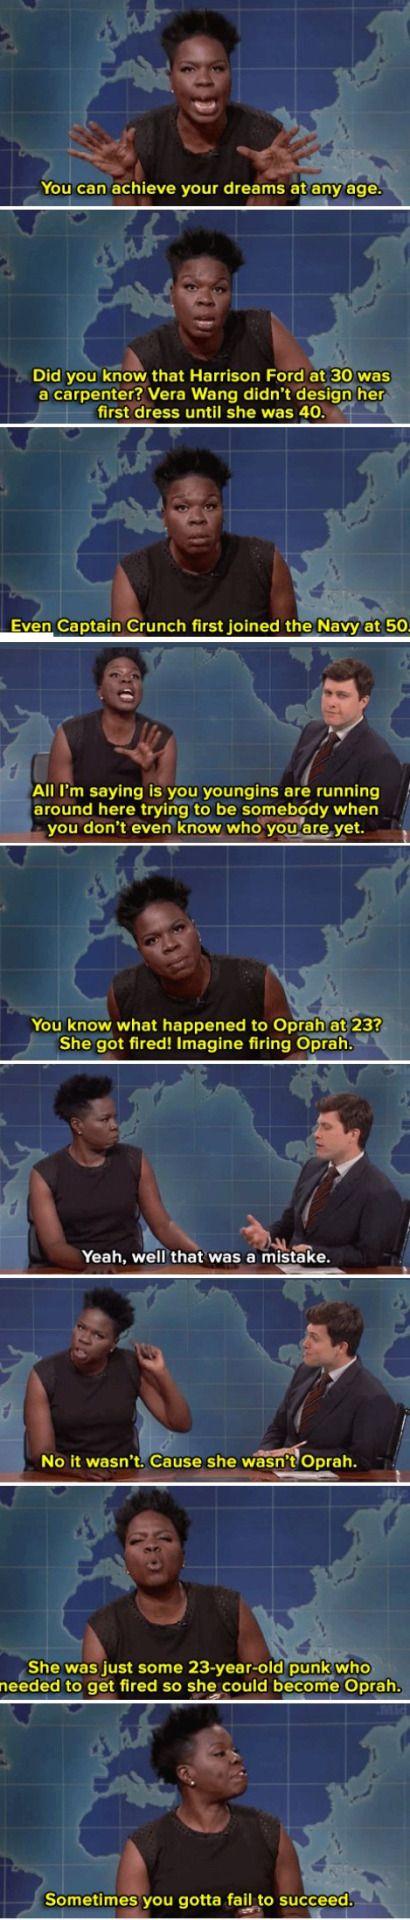 Leslie Jones spittin' truth on SNL last week.: